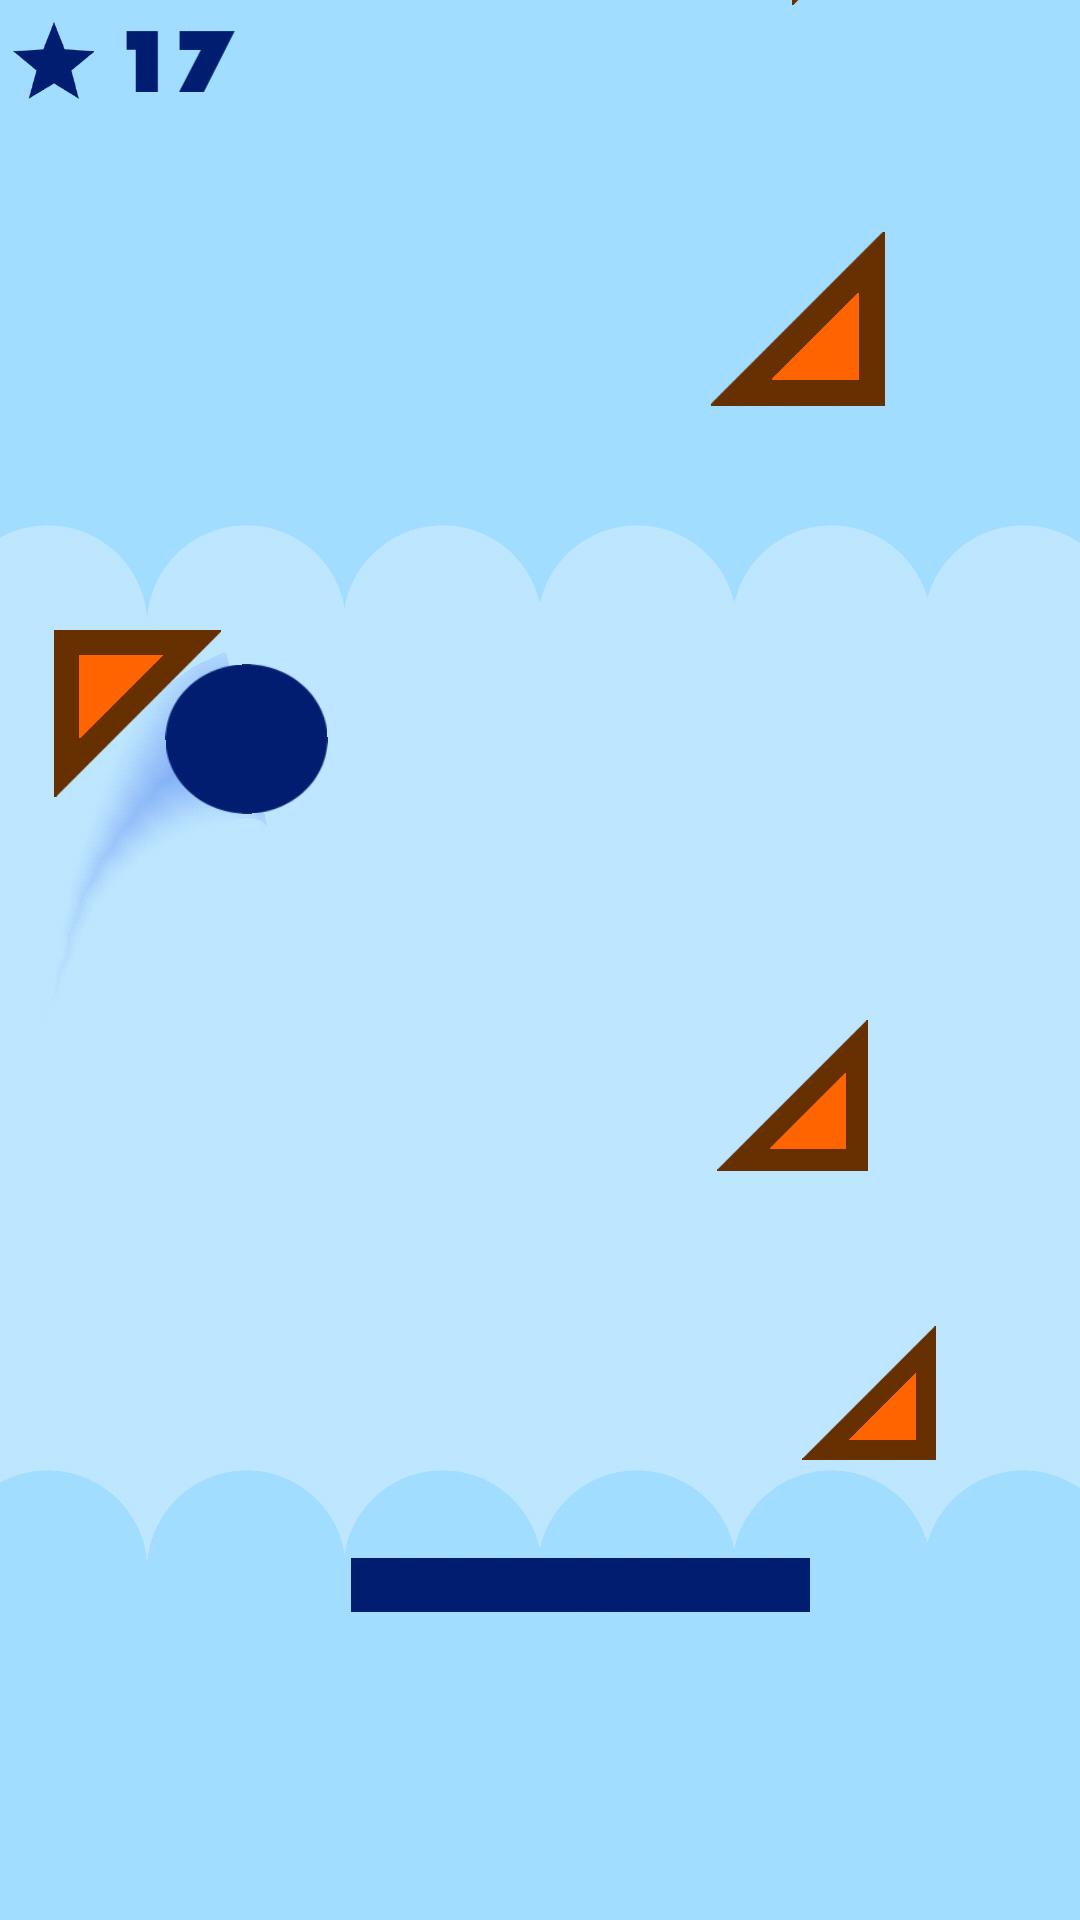 Игры на планшет - top-android.org